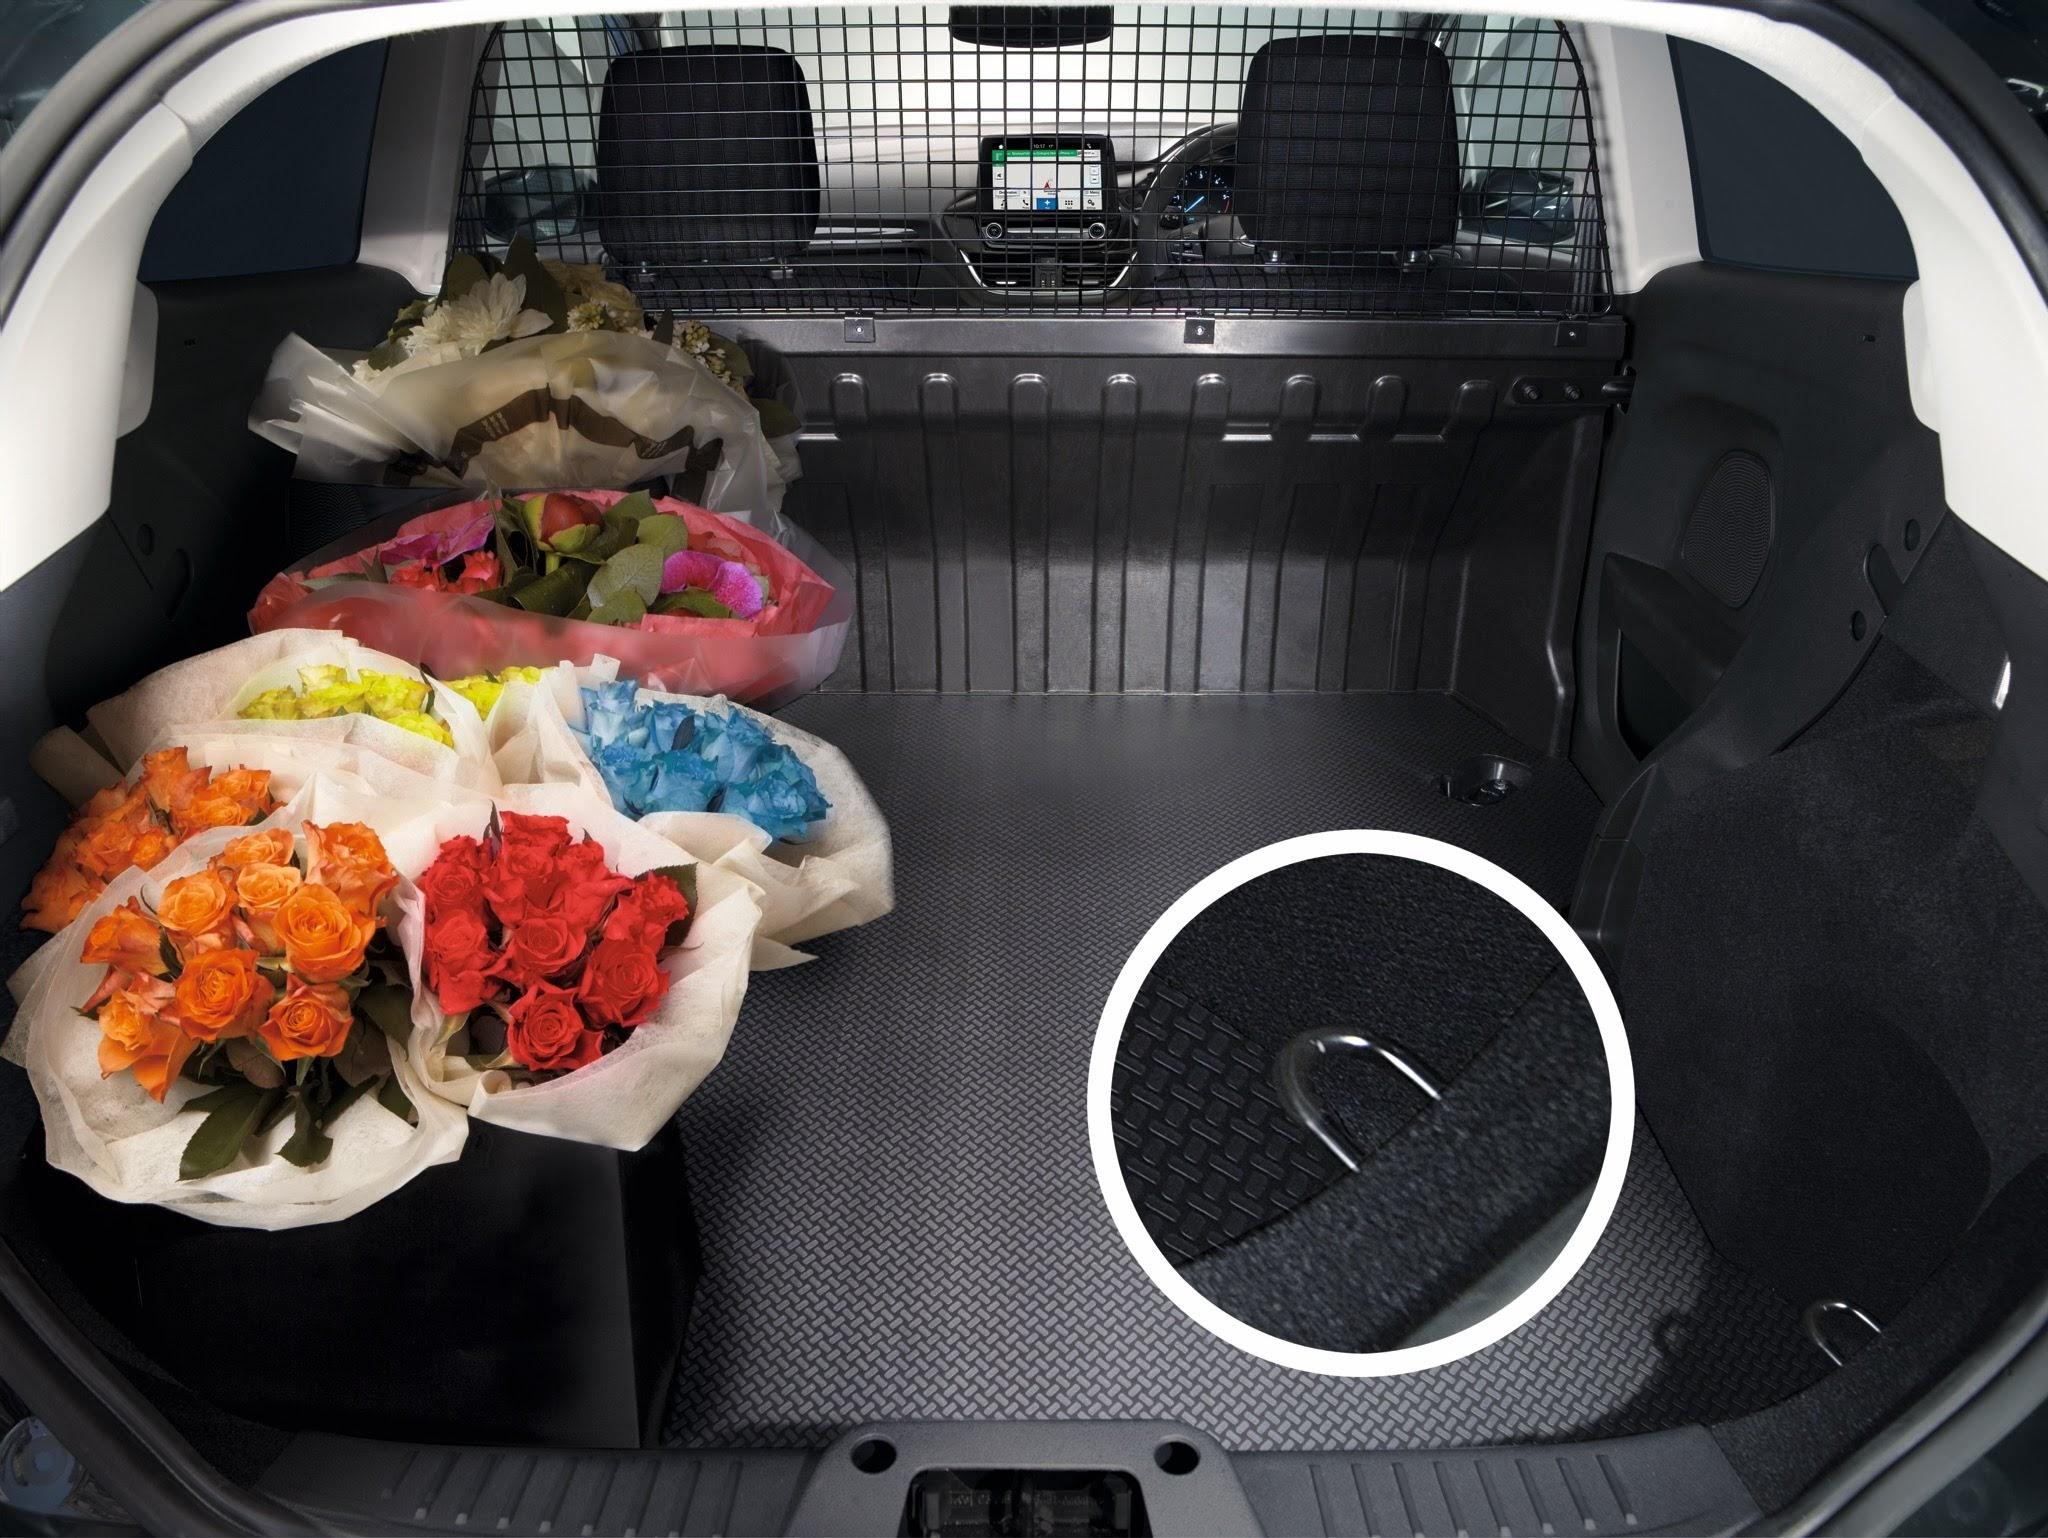 VhhPM uL6yP6m8ZWMn2VspMqaw17qndYQkqXTJl3qzHtQNdsl4InpCPZZiBie4BNPxPoeR6XFOuZx7kDw3cyzW1WfORcCPBVZ6NGCFCF081IJWoqKP643c57nja675Qbdcb2QMbNOQ=w2400 - Nuevo Ford Fiesta Van, más conectado y con versión deportiva